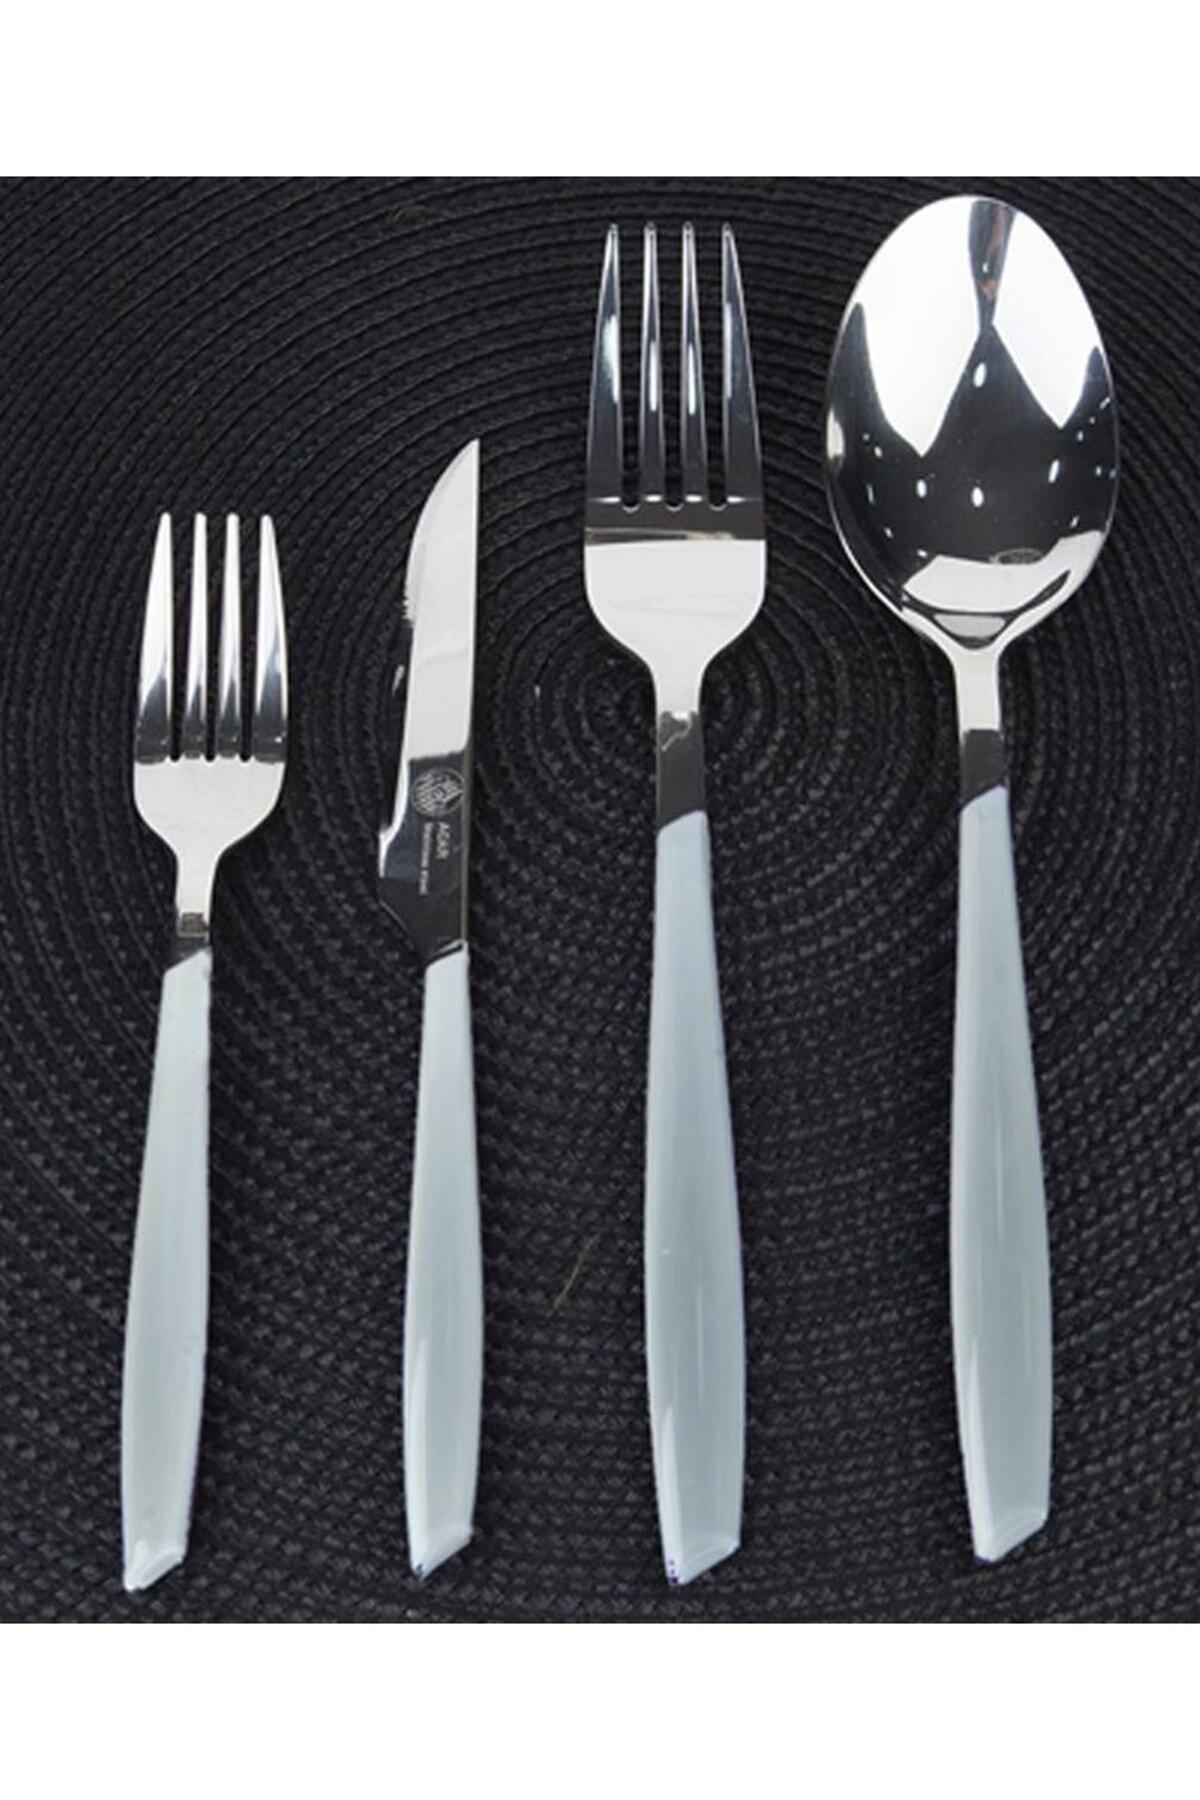 ACAR Beyaz 24 Parça Çatal Kaşık Bıçak Seti 1